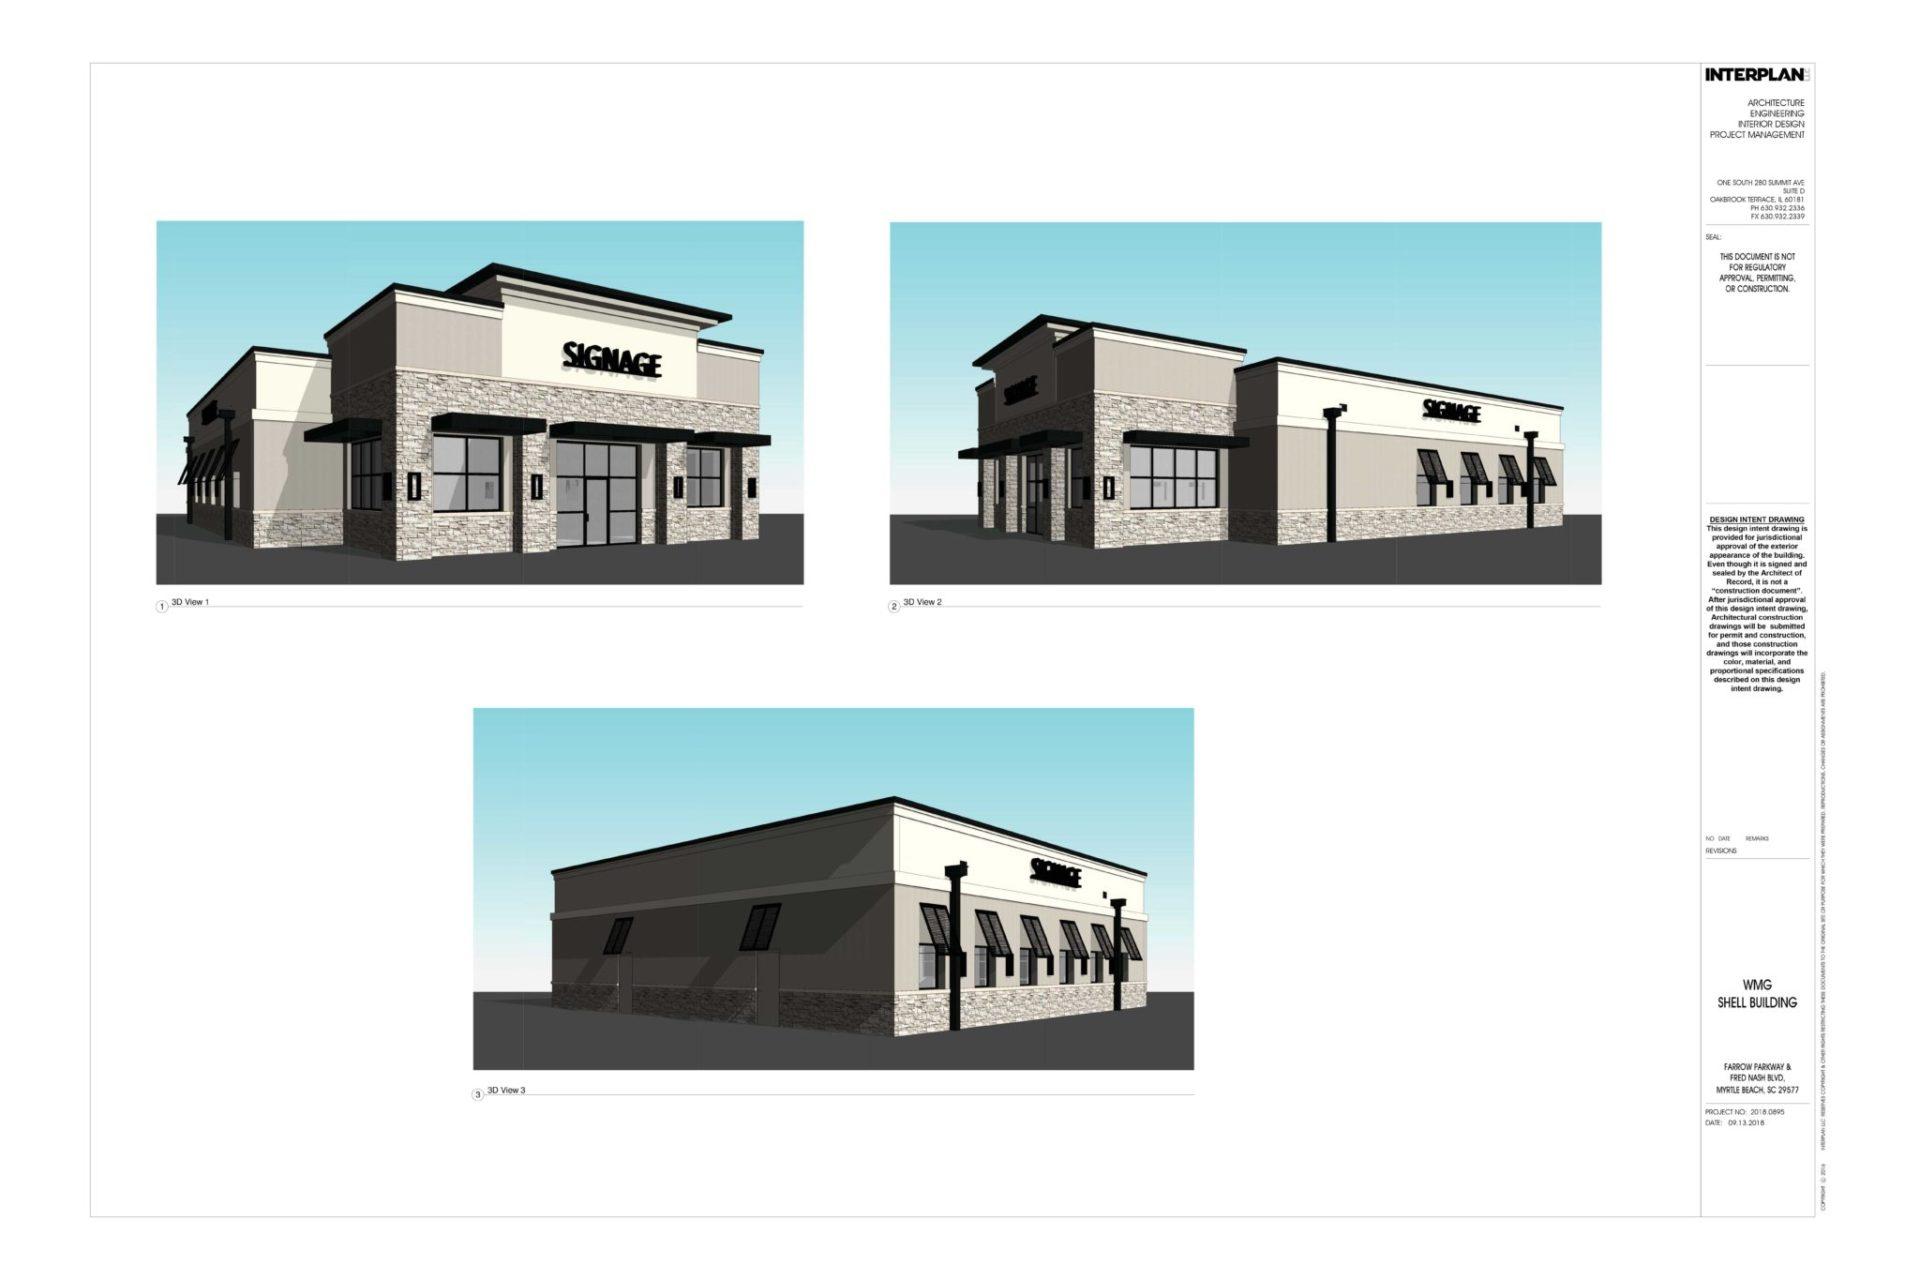 Farrow-Park-Myrtle-Beach-Professional-Development-1